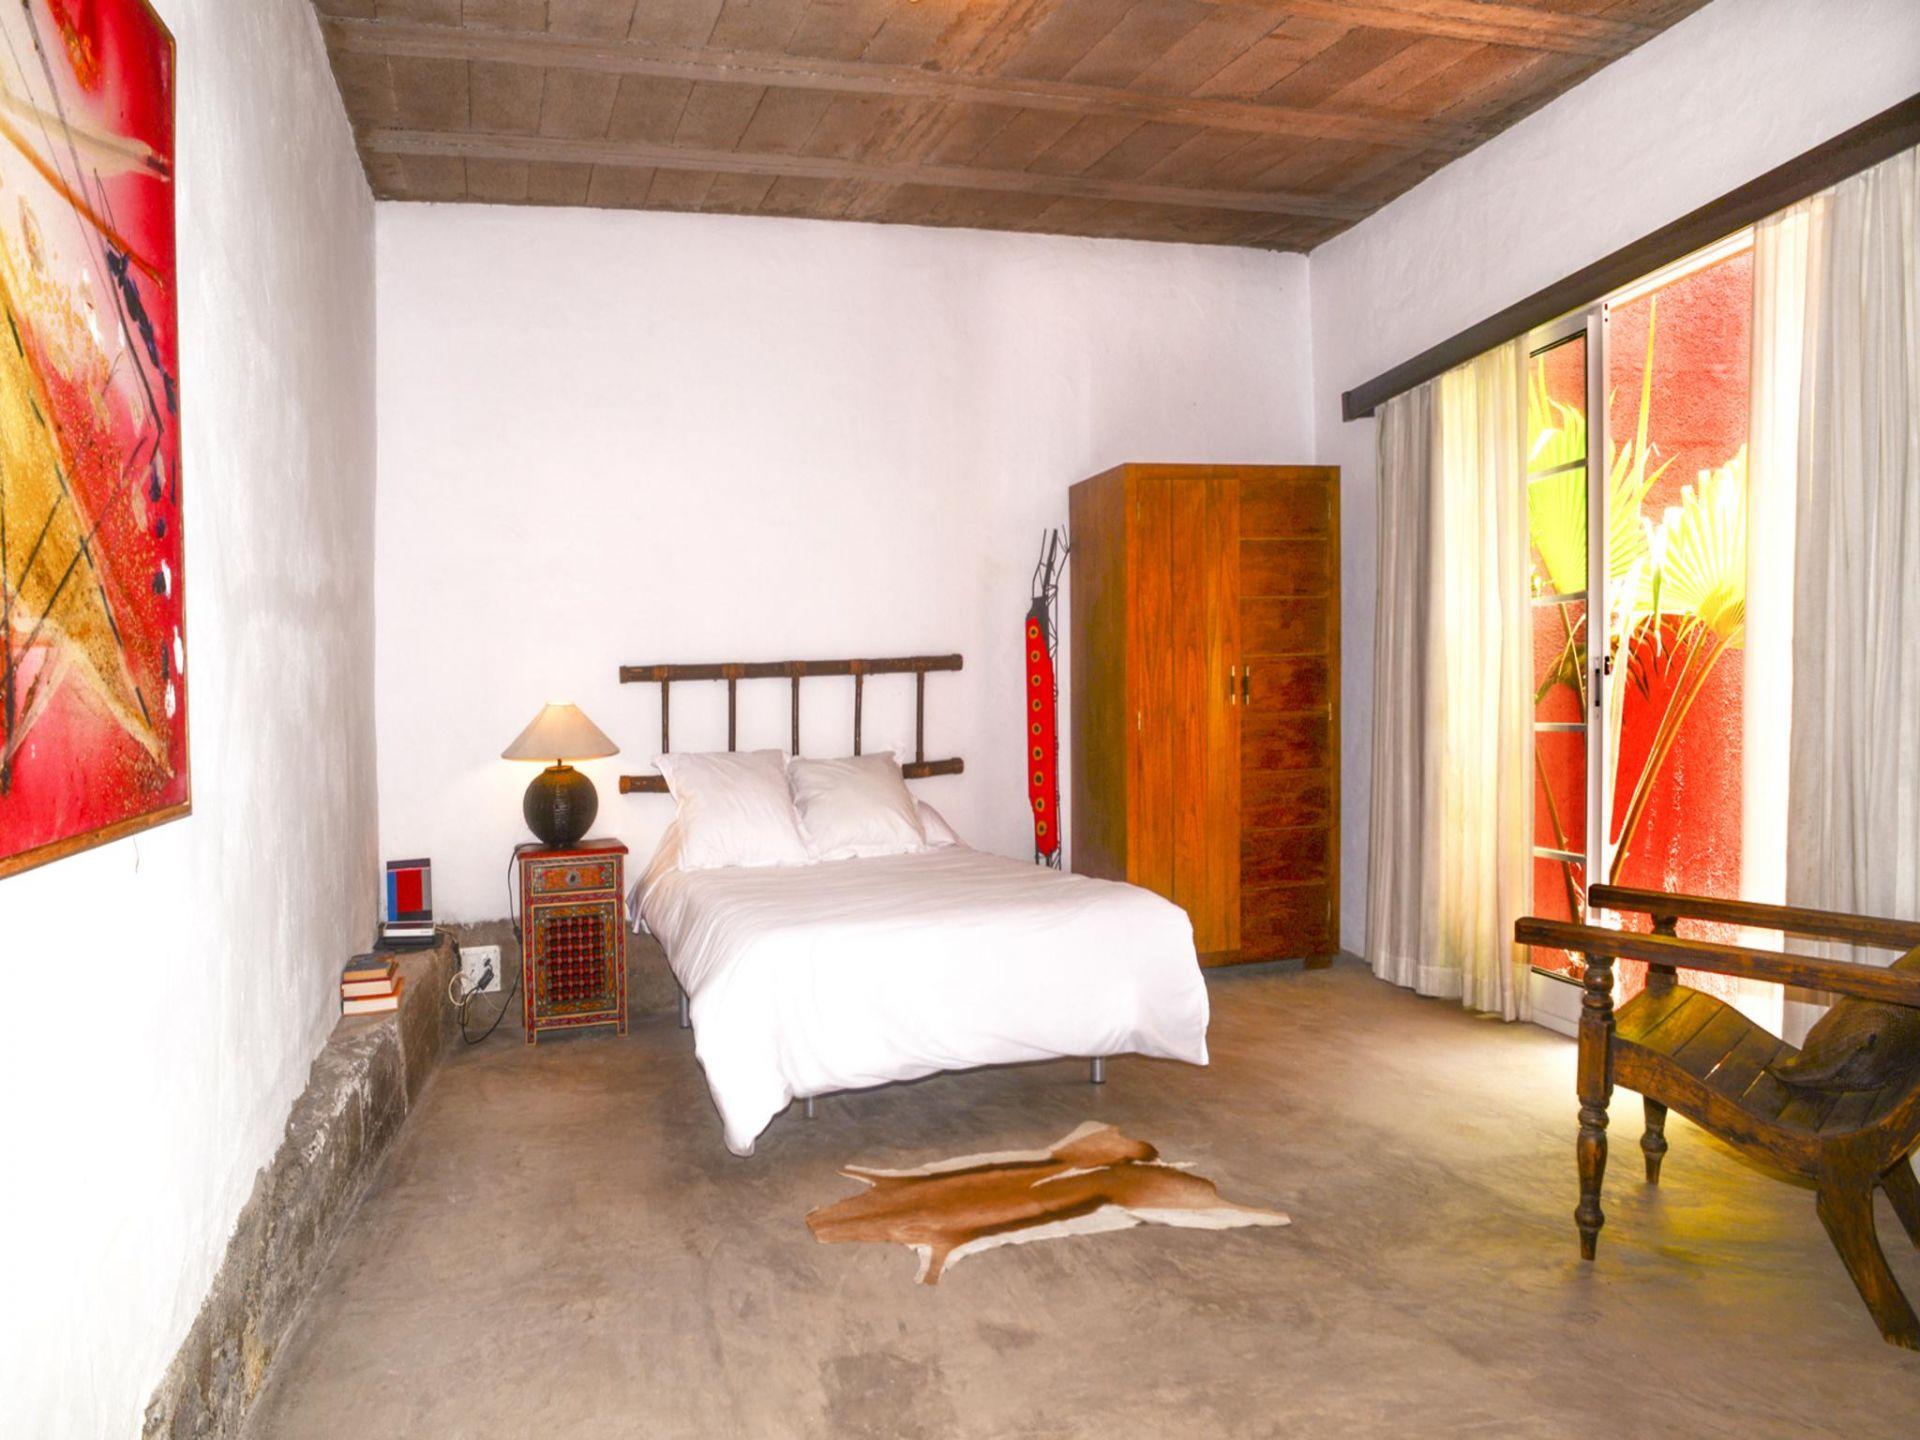 Holiday apartment Villa San Agustin 10 - Holiday Rental (854295), Maspalomas, Gran Canaria, Canary Islands, Spain, picture 23